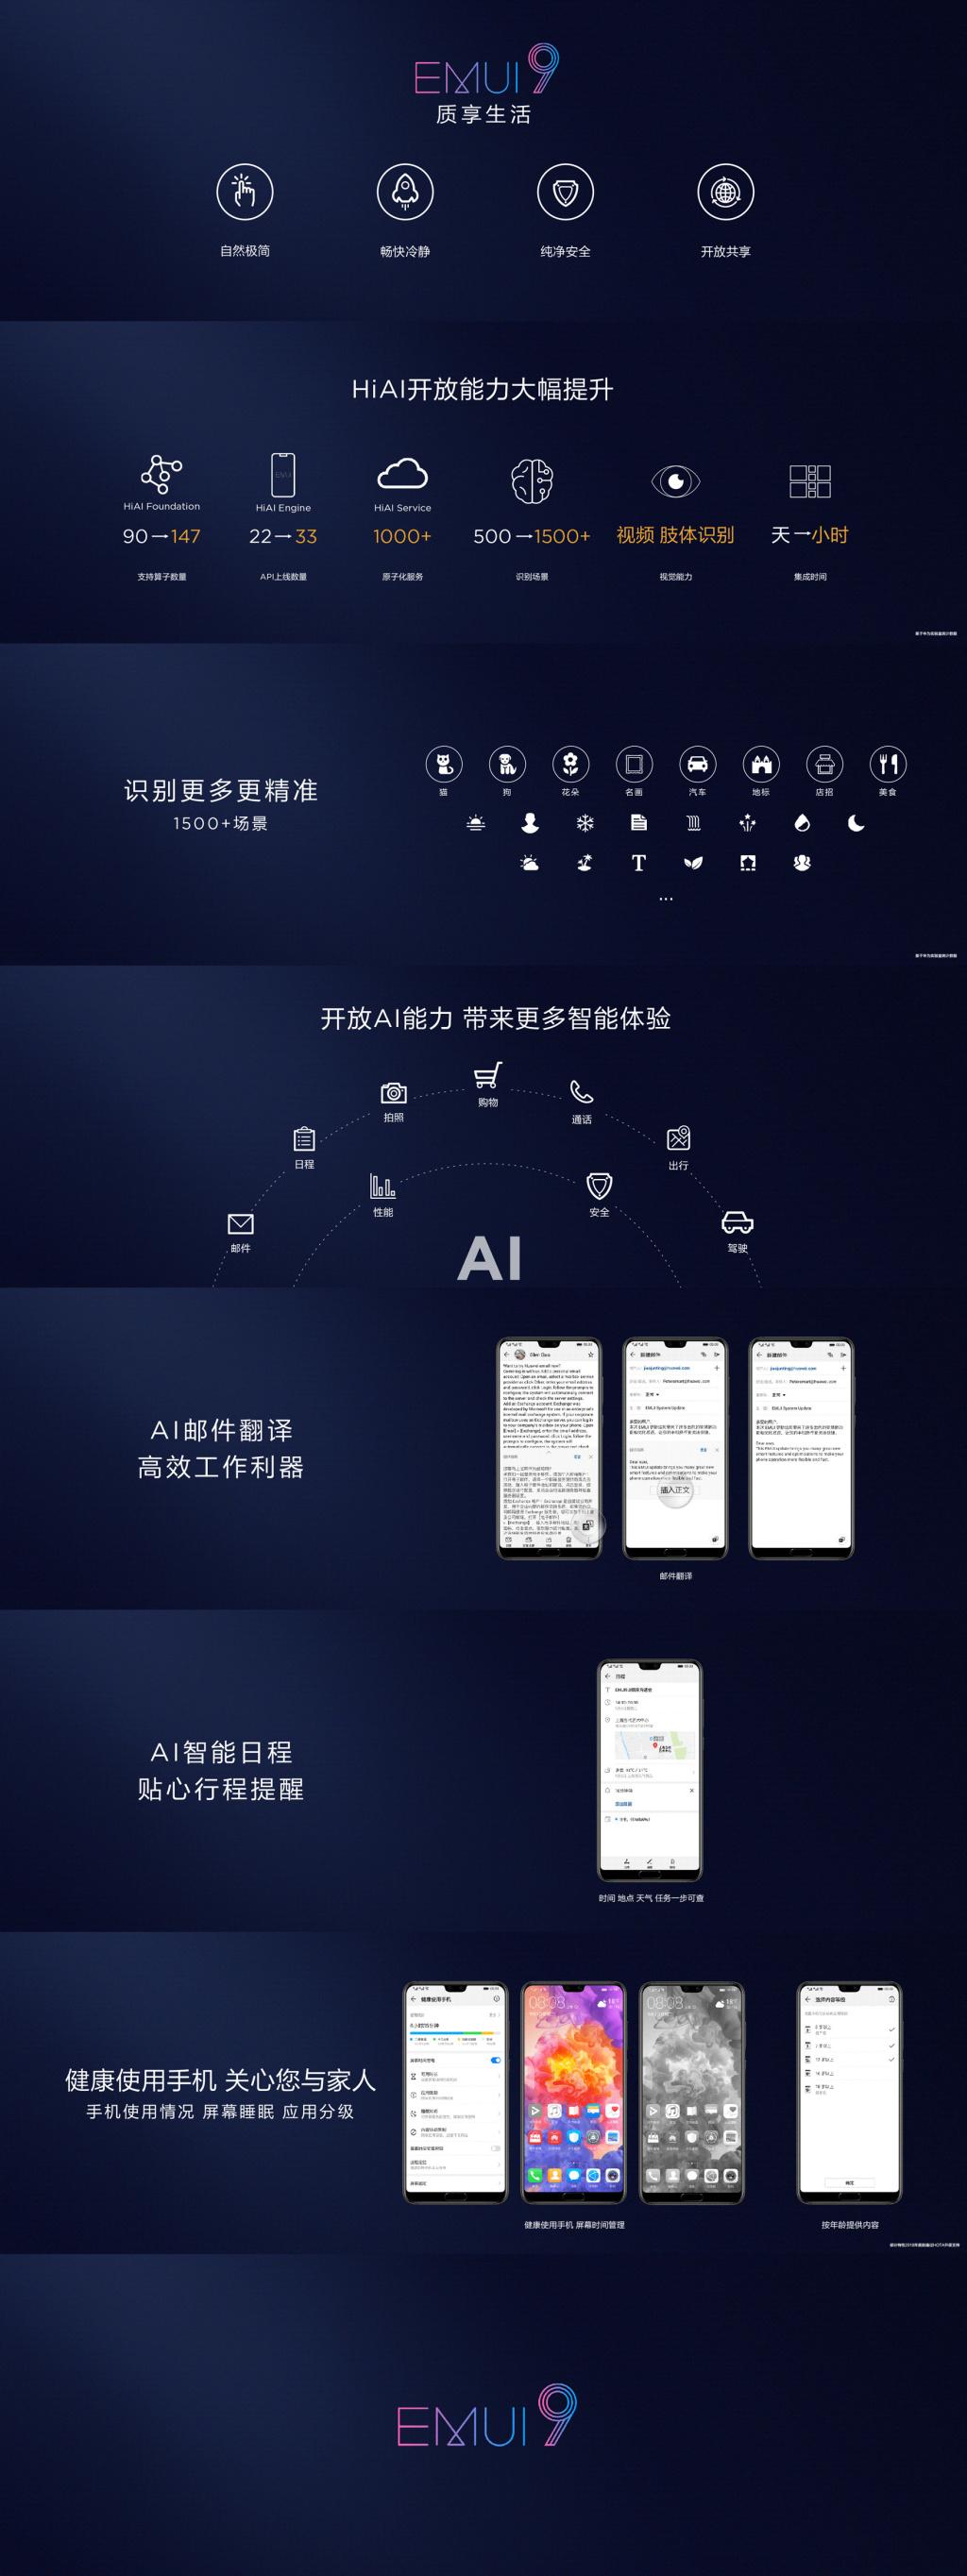 基于Android 9.0 华为EMUI 9发布:9款机型尝鲜